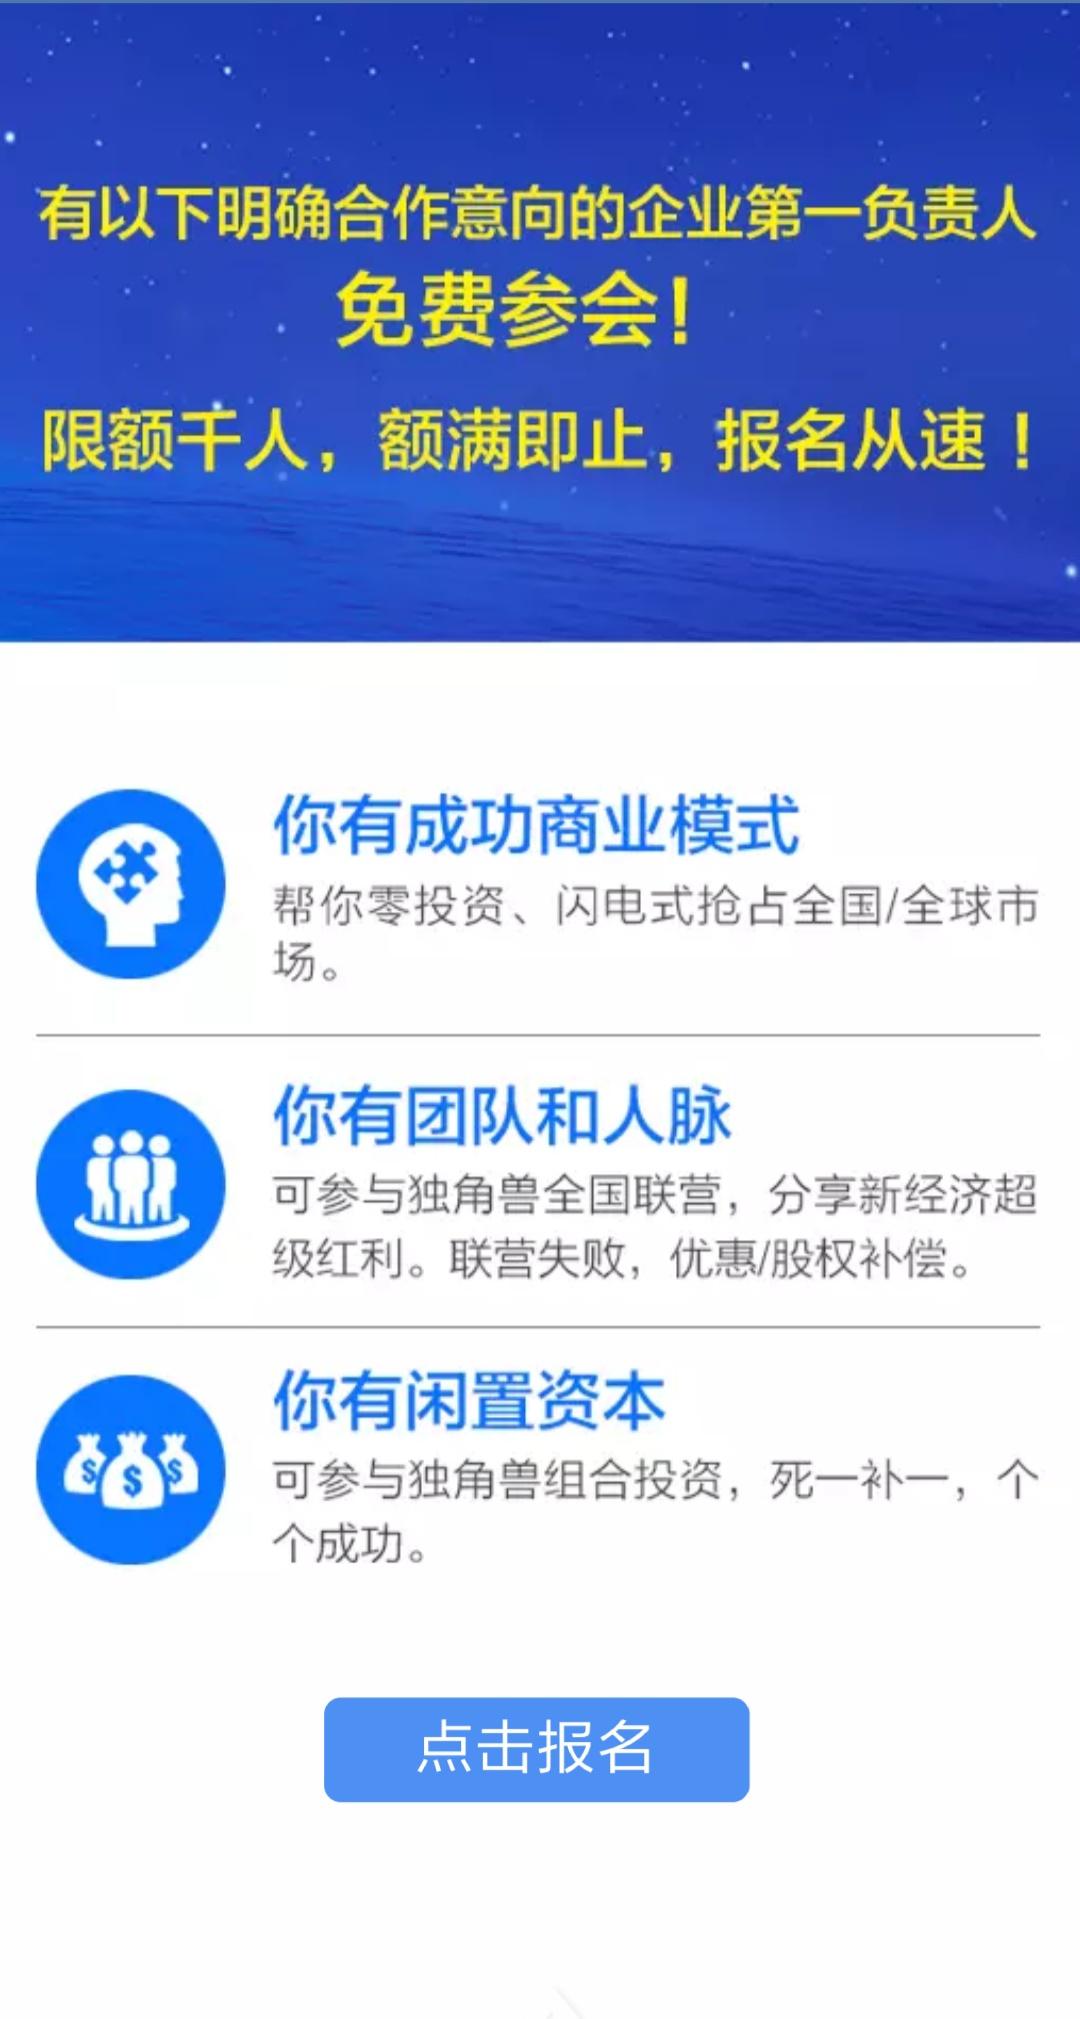 http://www.huodongxing.com/file/20190111/3403297949644/143423502426854.png